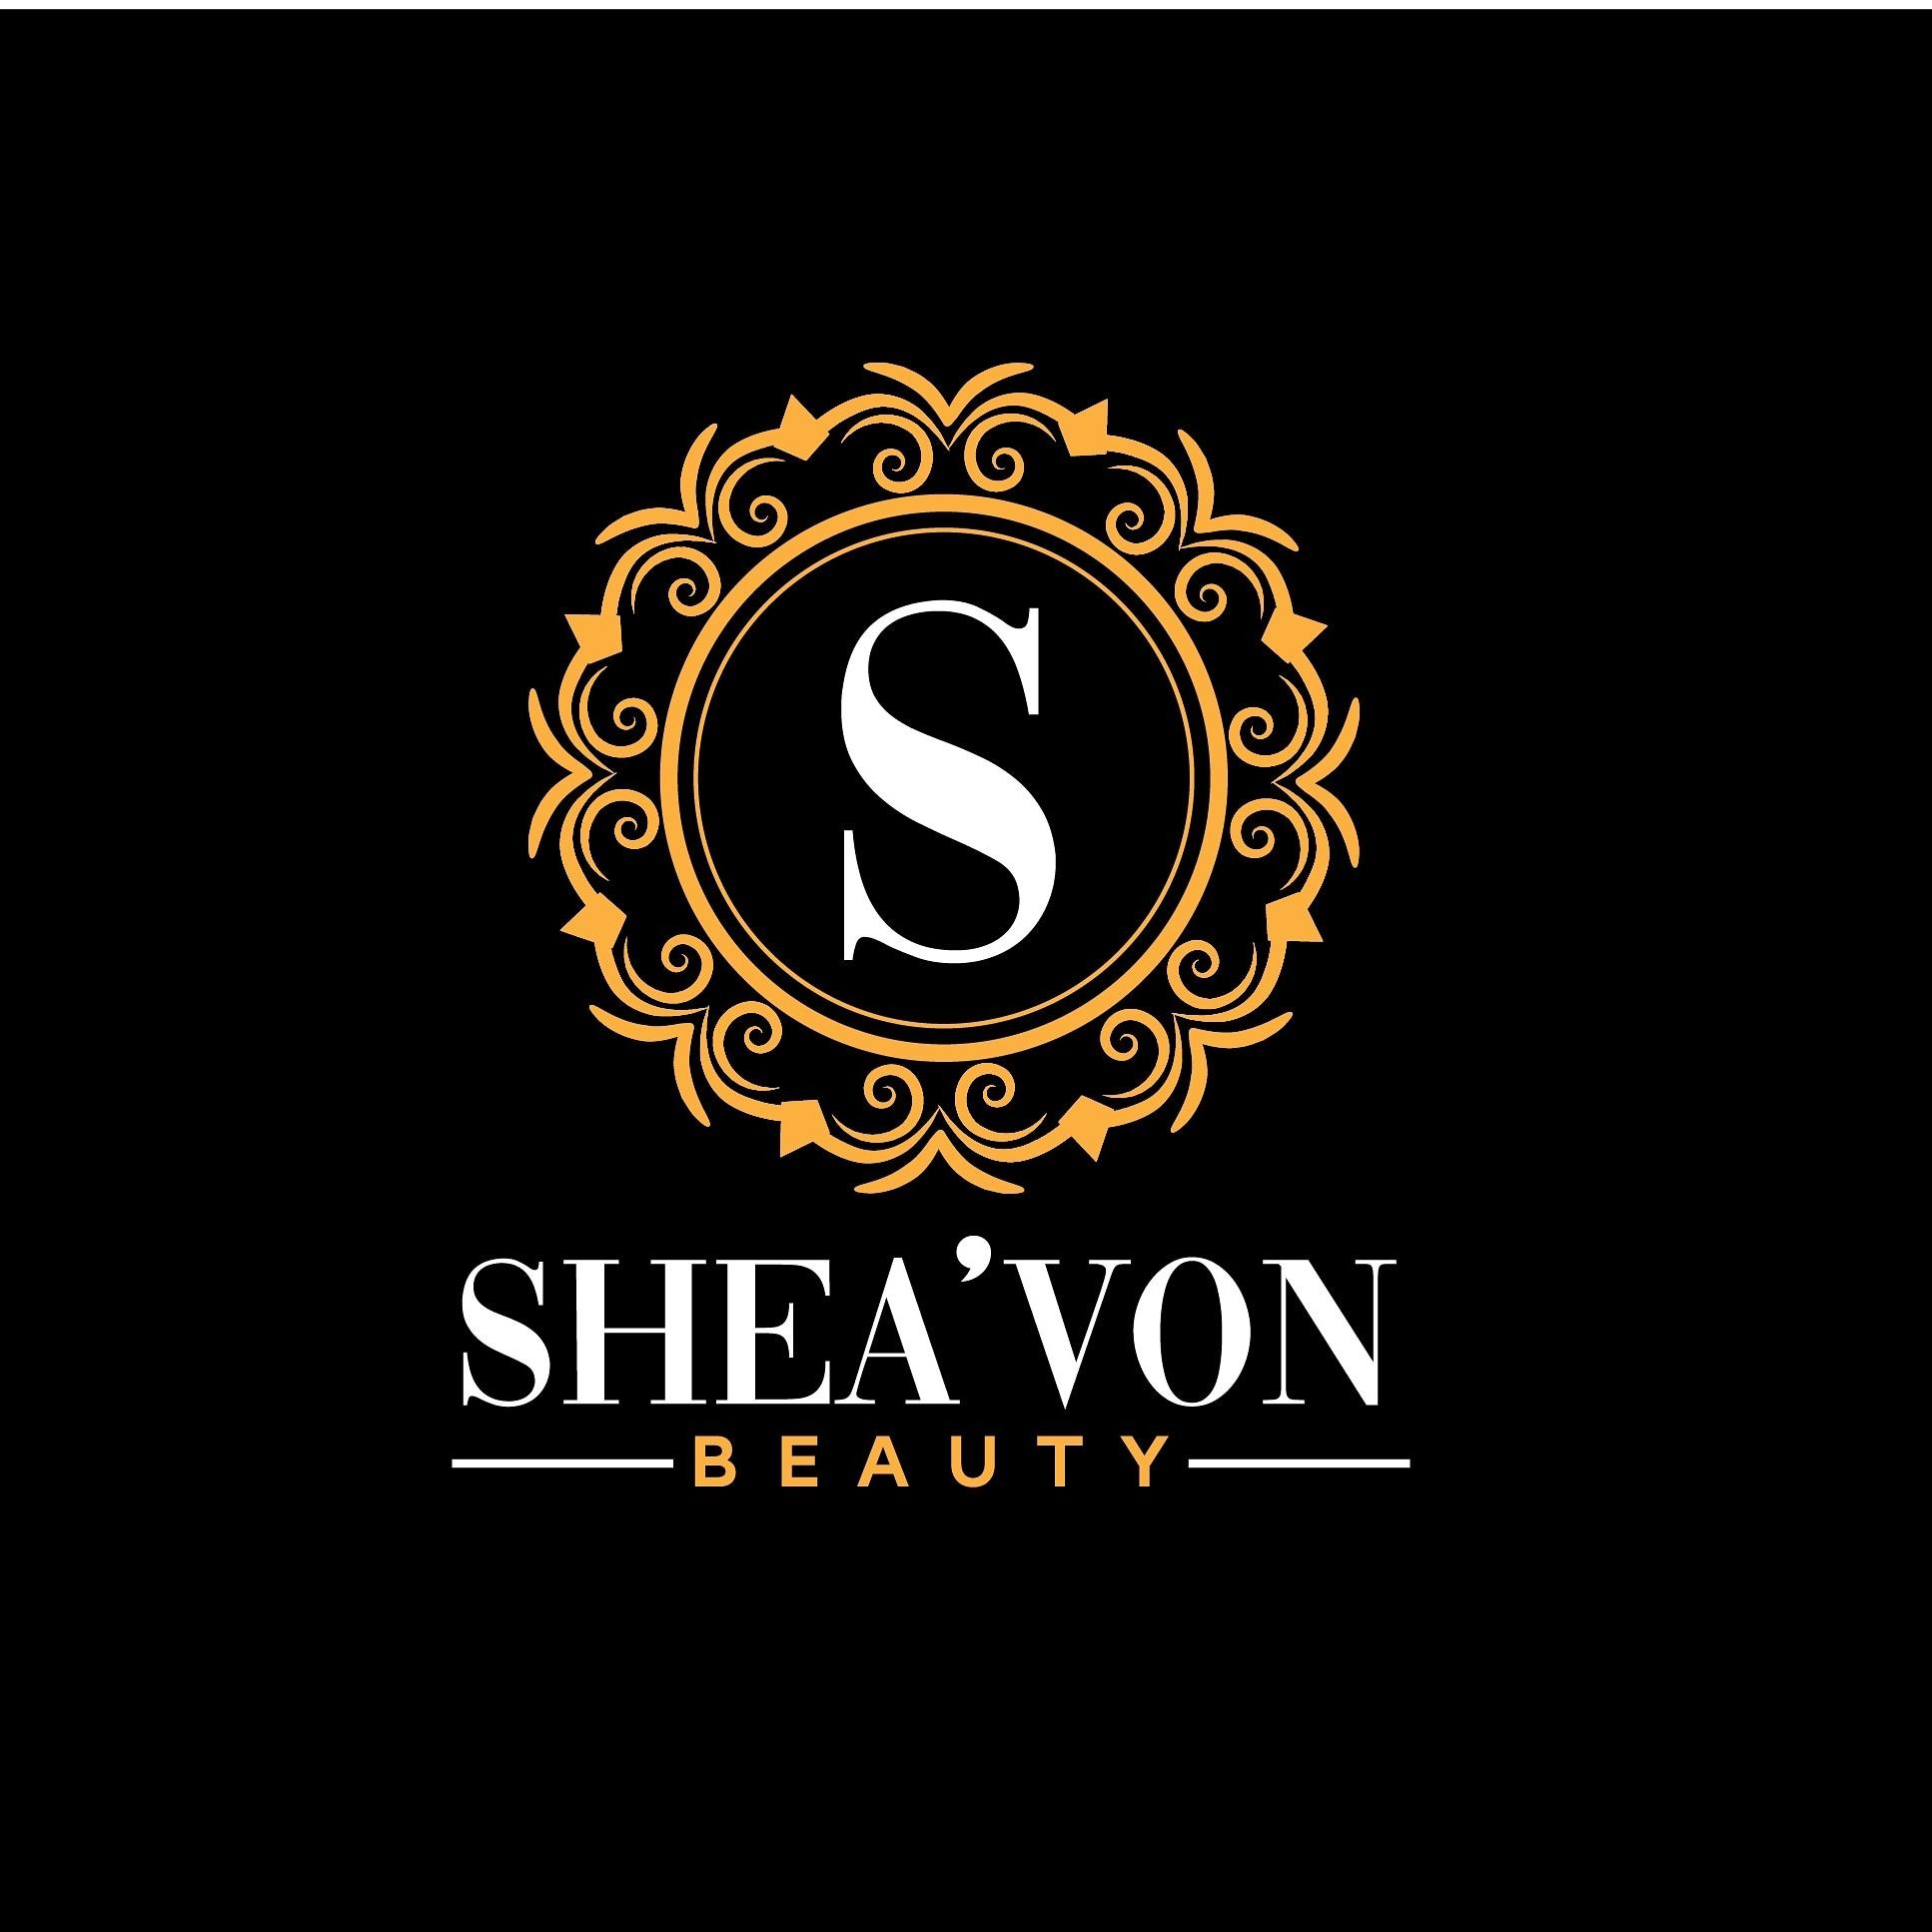 Sheavon Beauty Natural Artisan